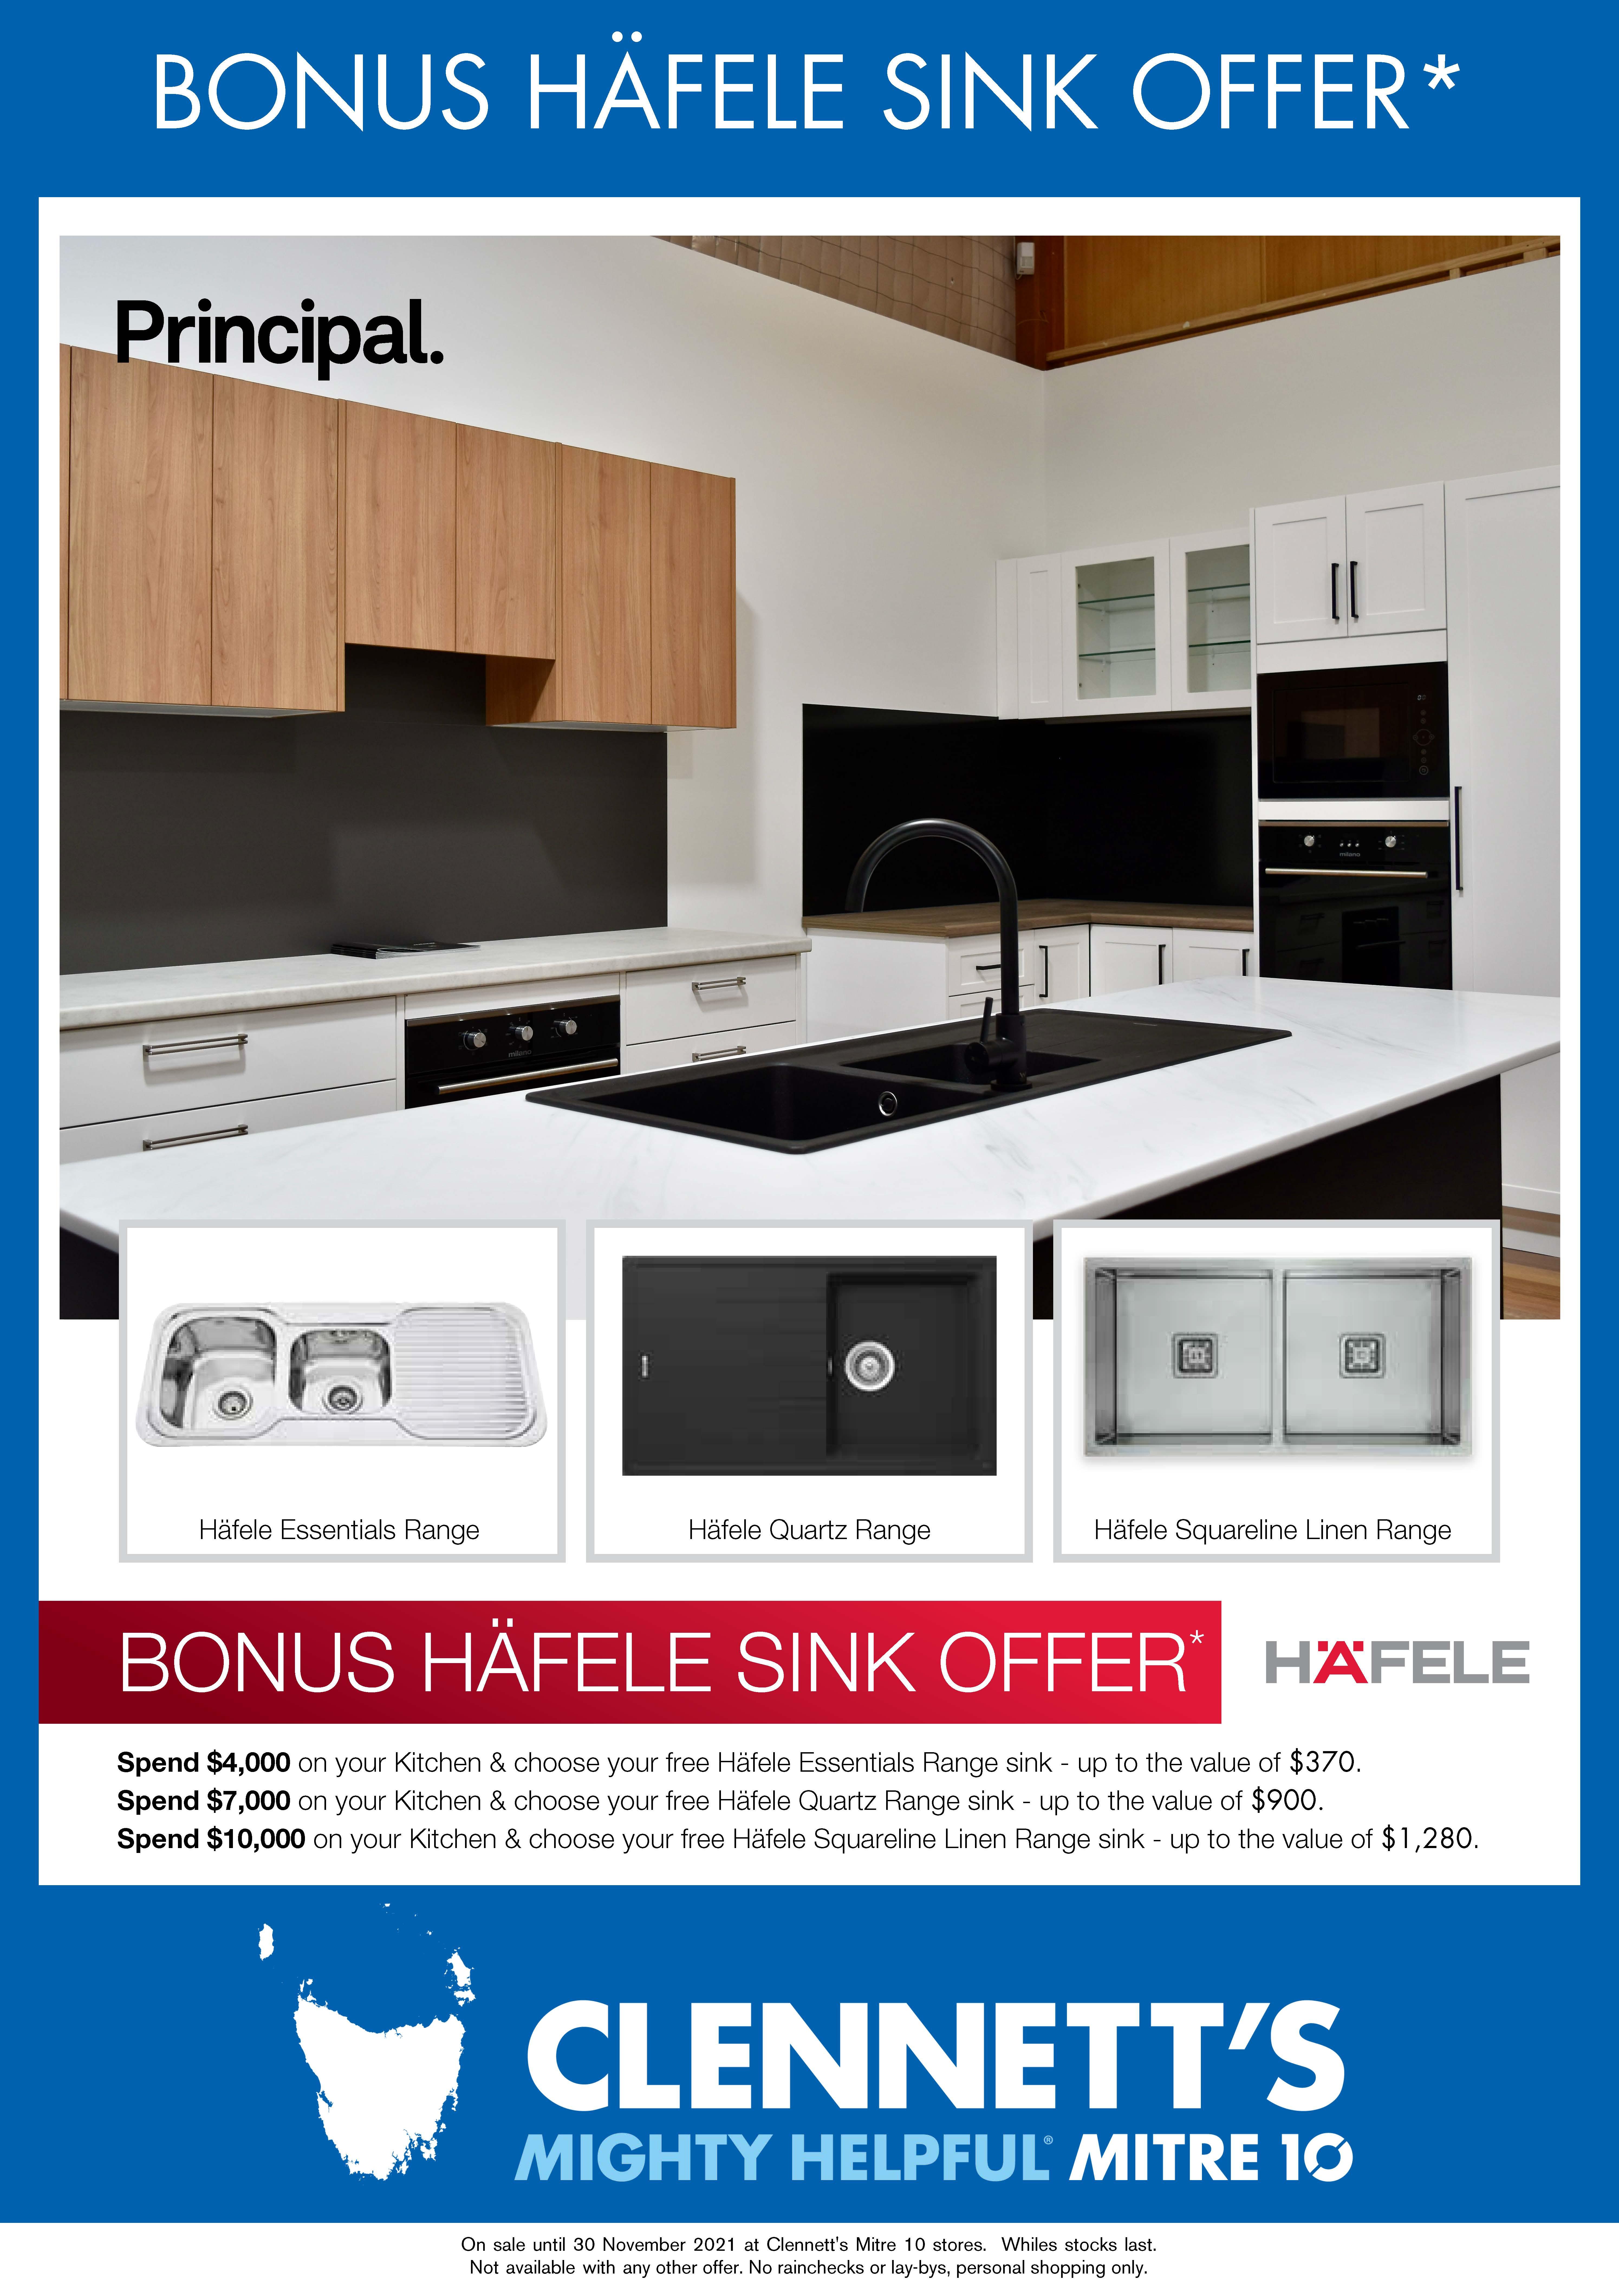 Clennett's Mitre 10 Hafele Sink promo flyer